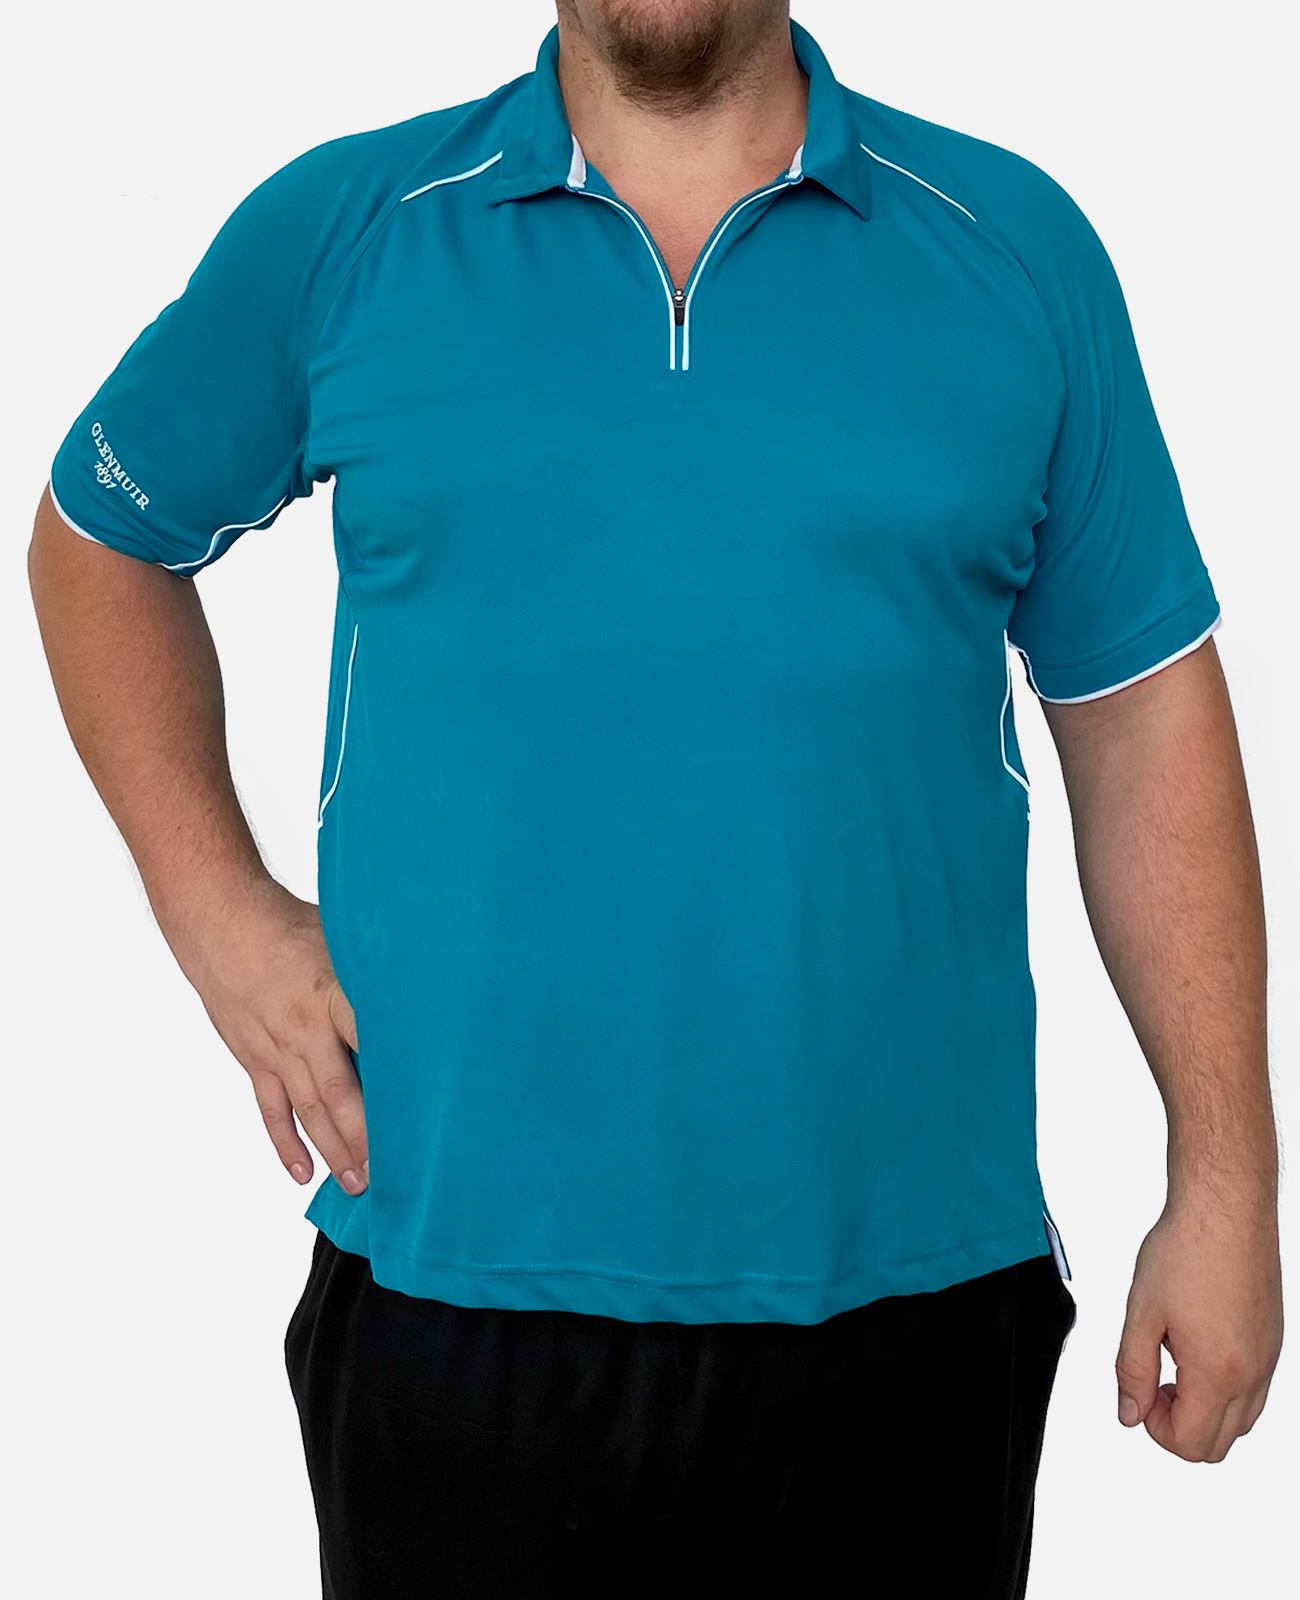 Мужская футболка поло Glenmuir